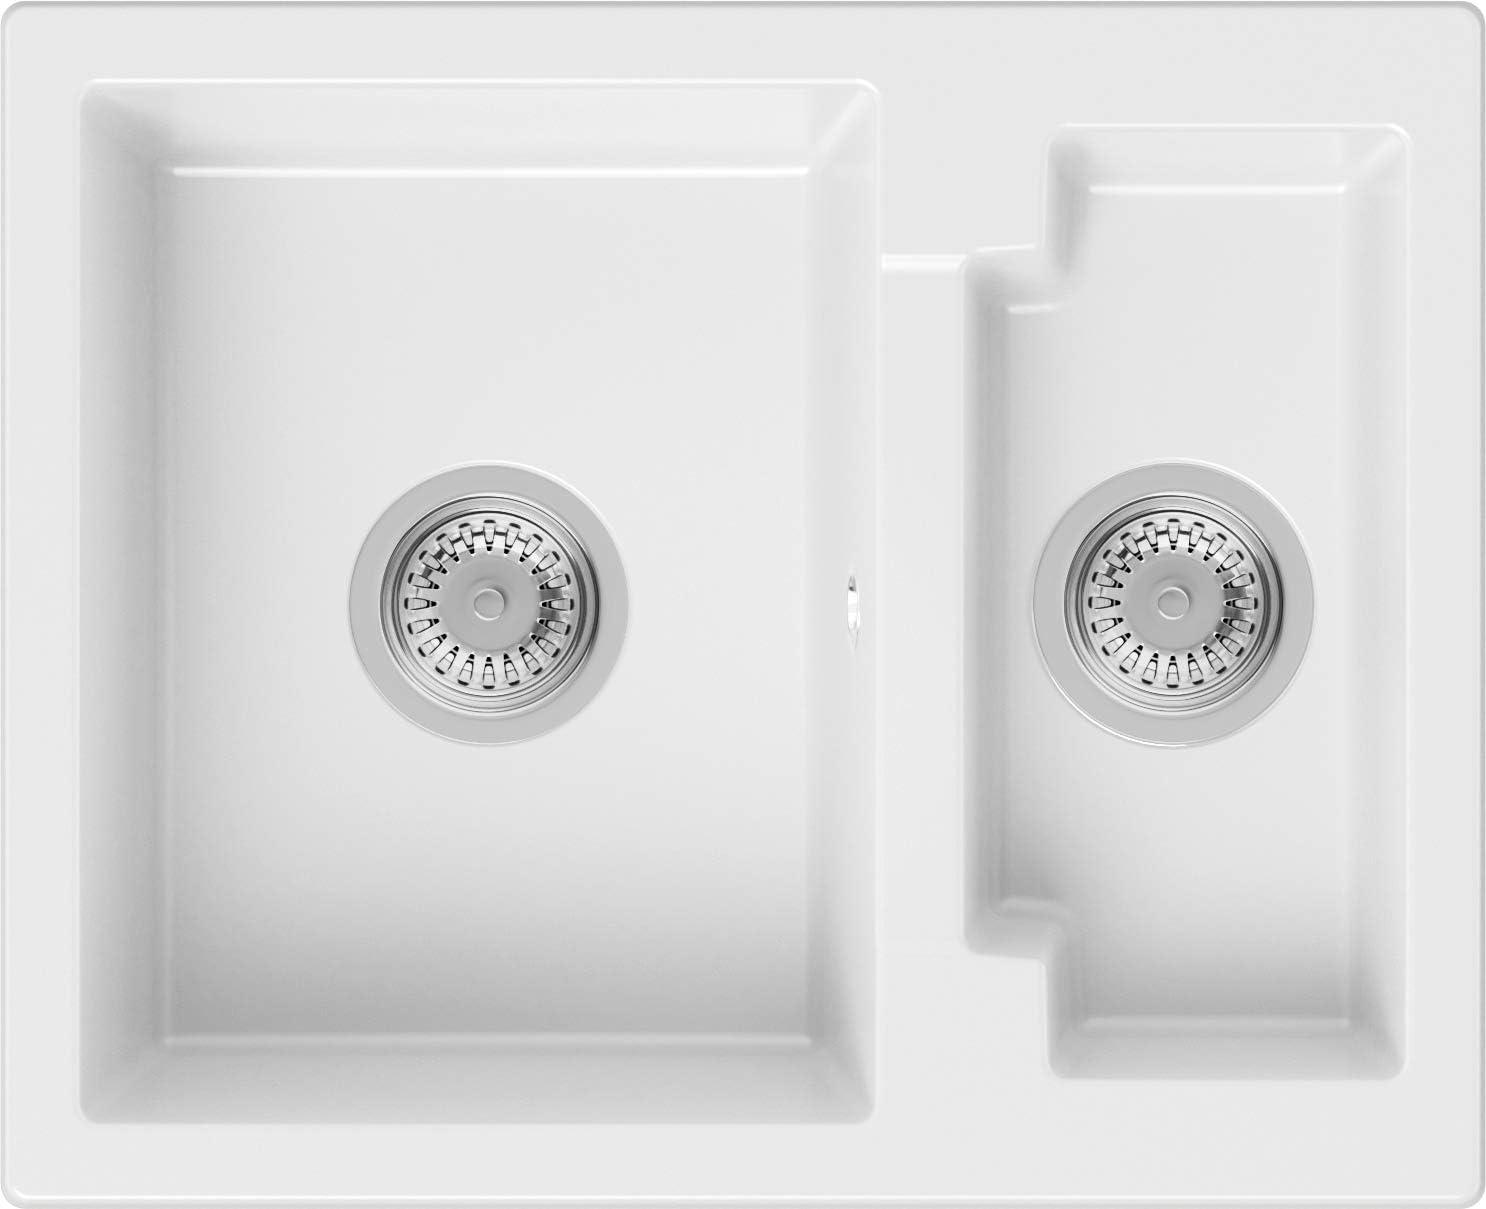 PRIMAGRAN Fregadero de Granito 59,5 x 48,5 cm, Lavabo Cocina 1,5 Senos + Sifón Clásico, Fregadero Empotrado Paris, Blanco